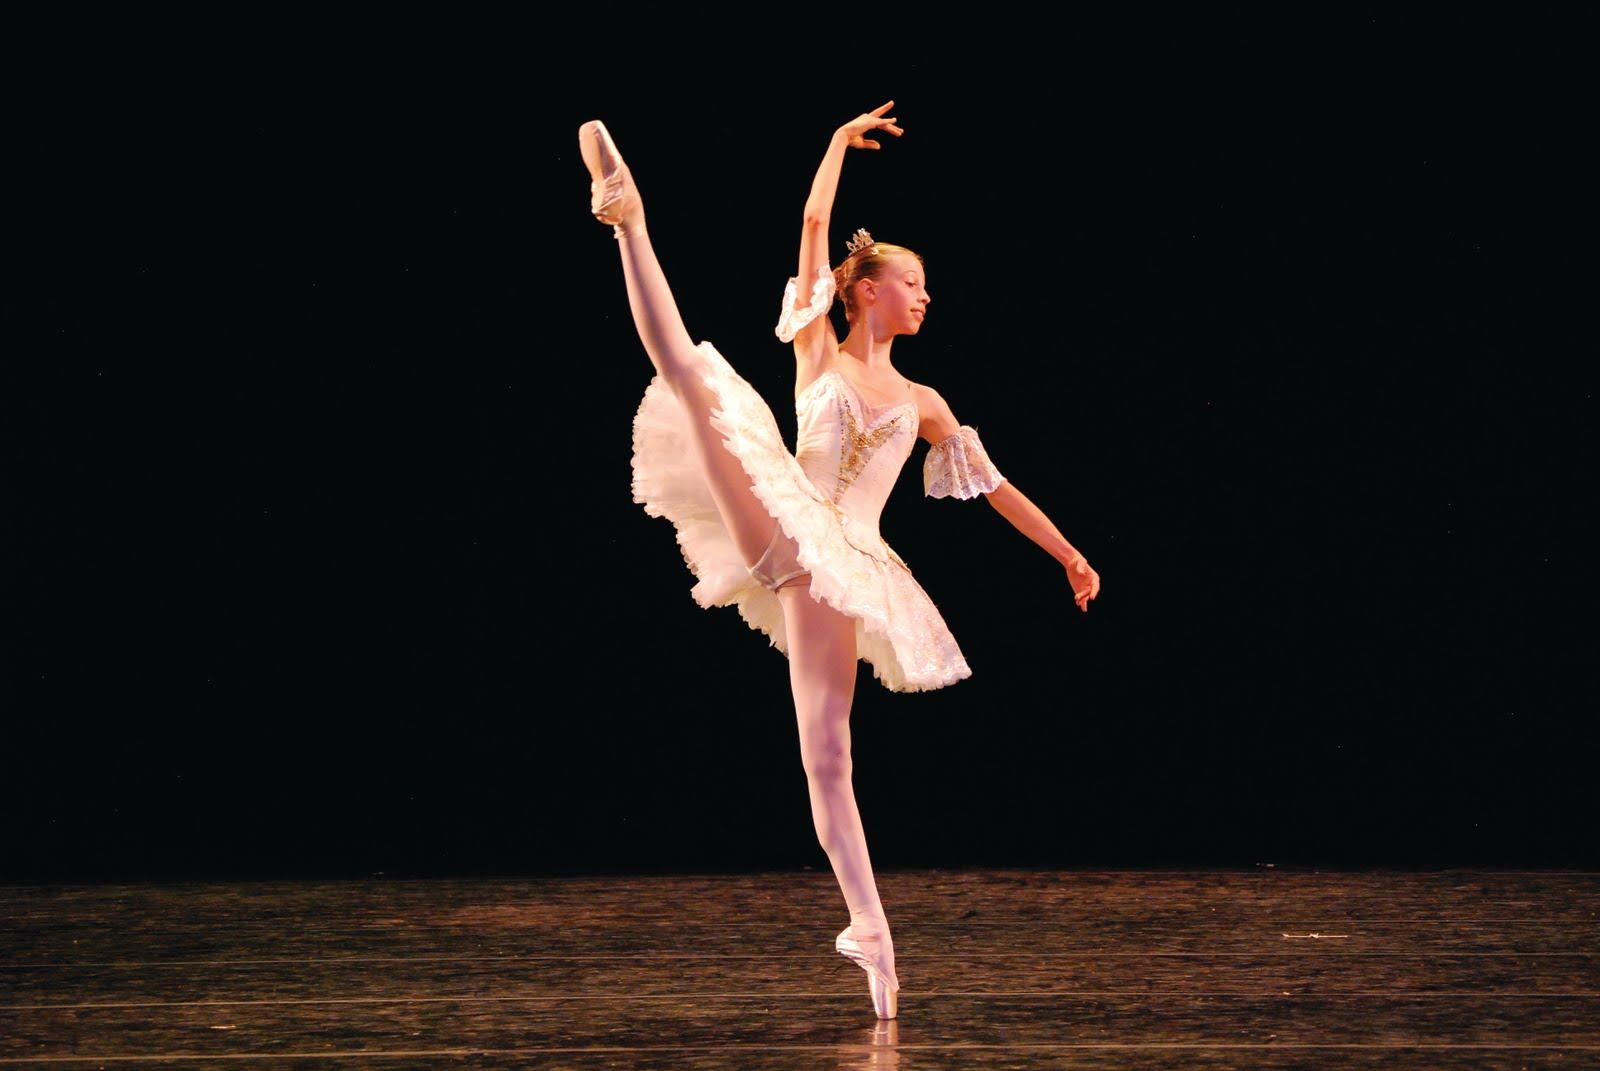 44 Ballet Wallpaper Hd On Wallpapersafari